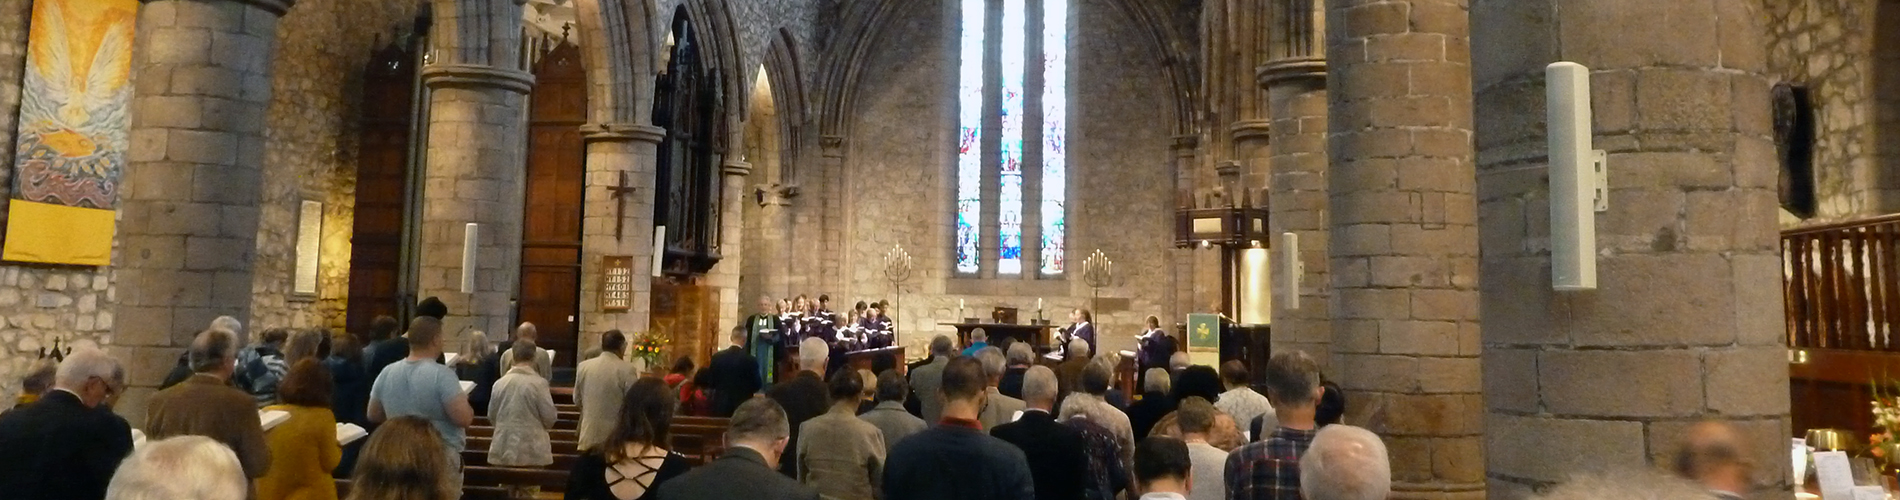 St Machar's, Aberdeen